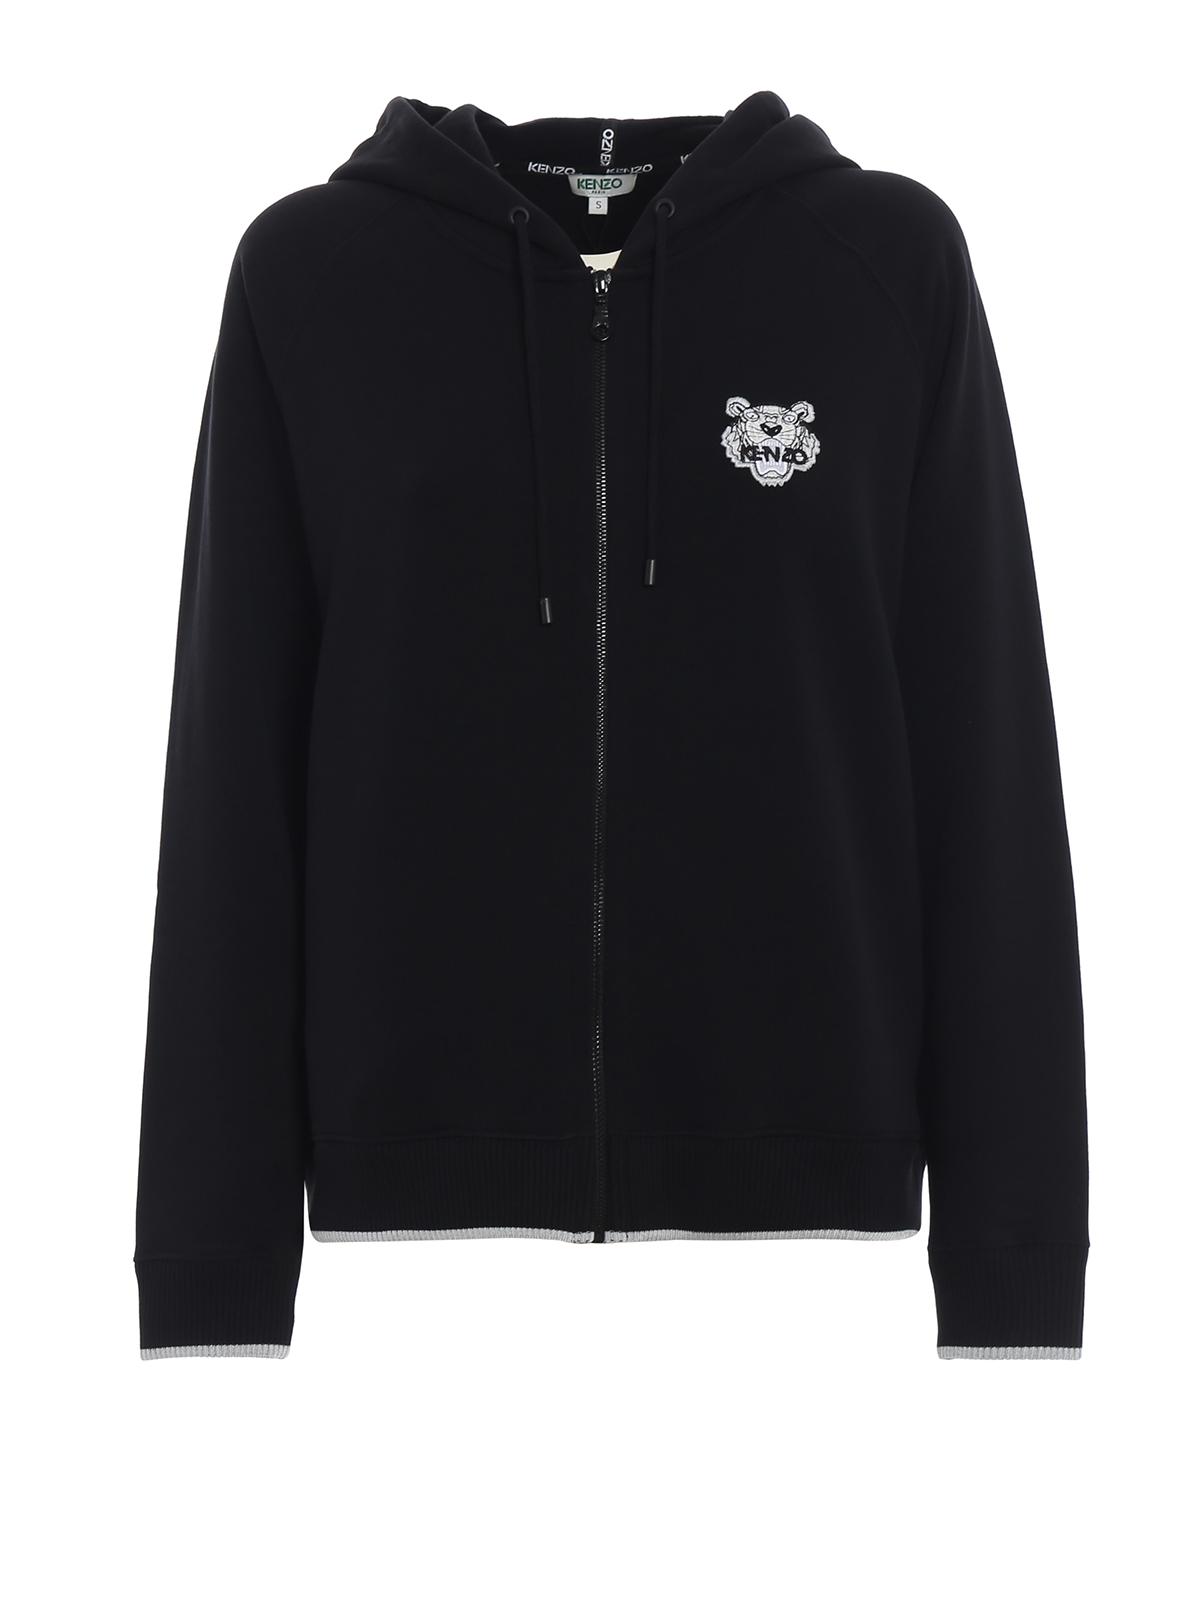 7fefb864c Kenzo - Tiger crest zip cotton hoodie - Sweatshirts & Sweaters ...